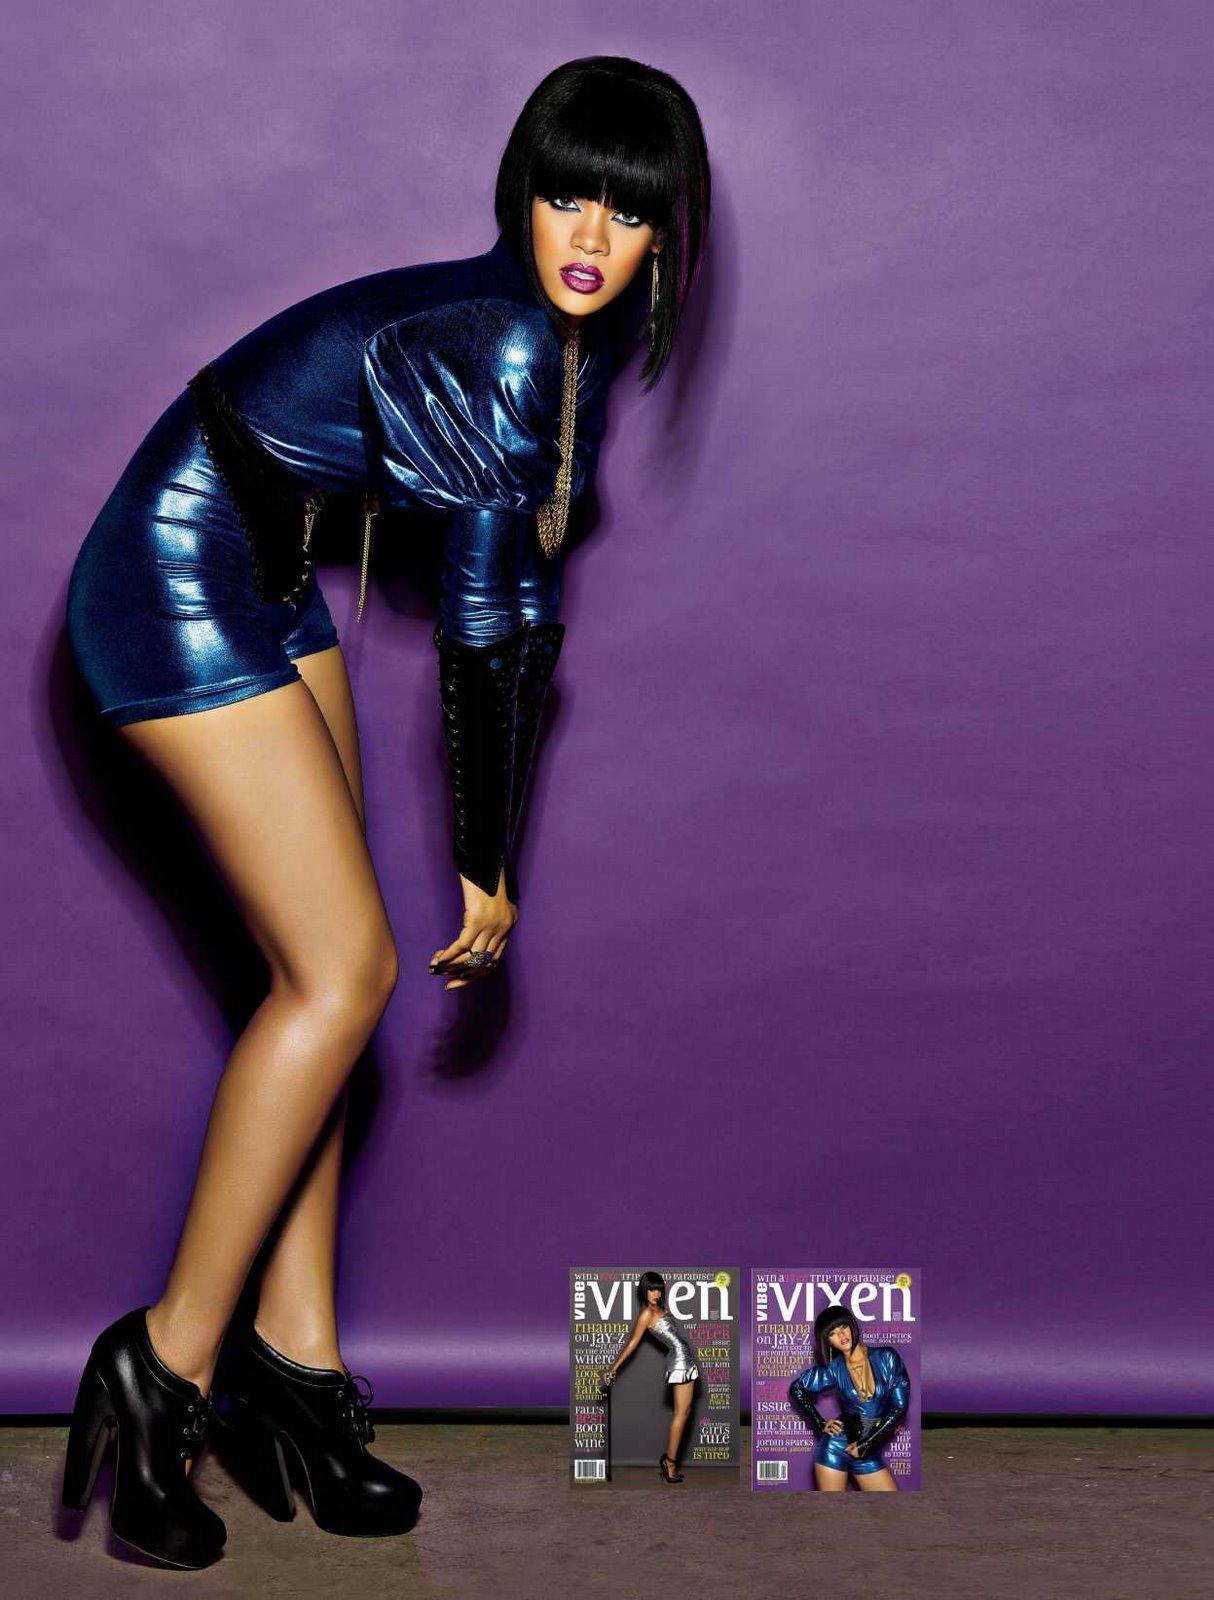 rihanna � vibe vixen photoshoot sweet celebrity